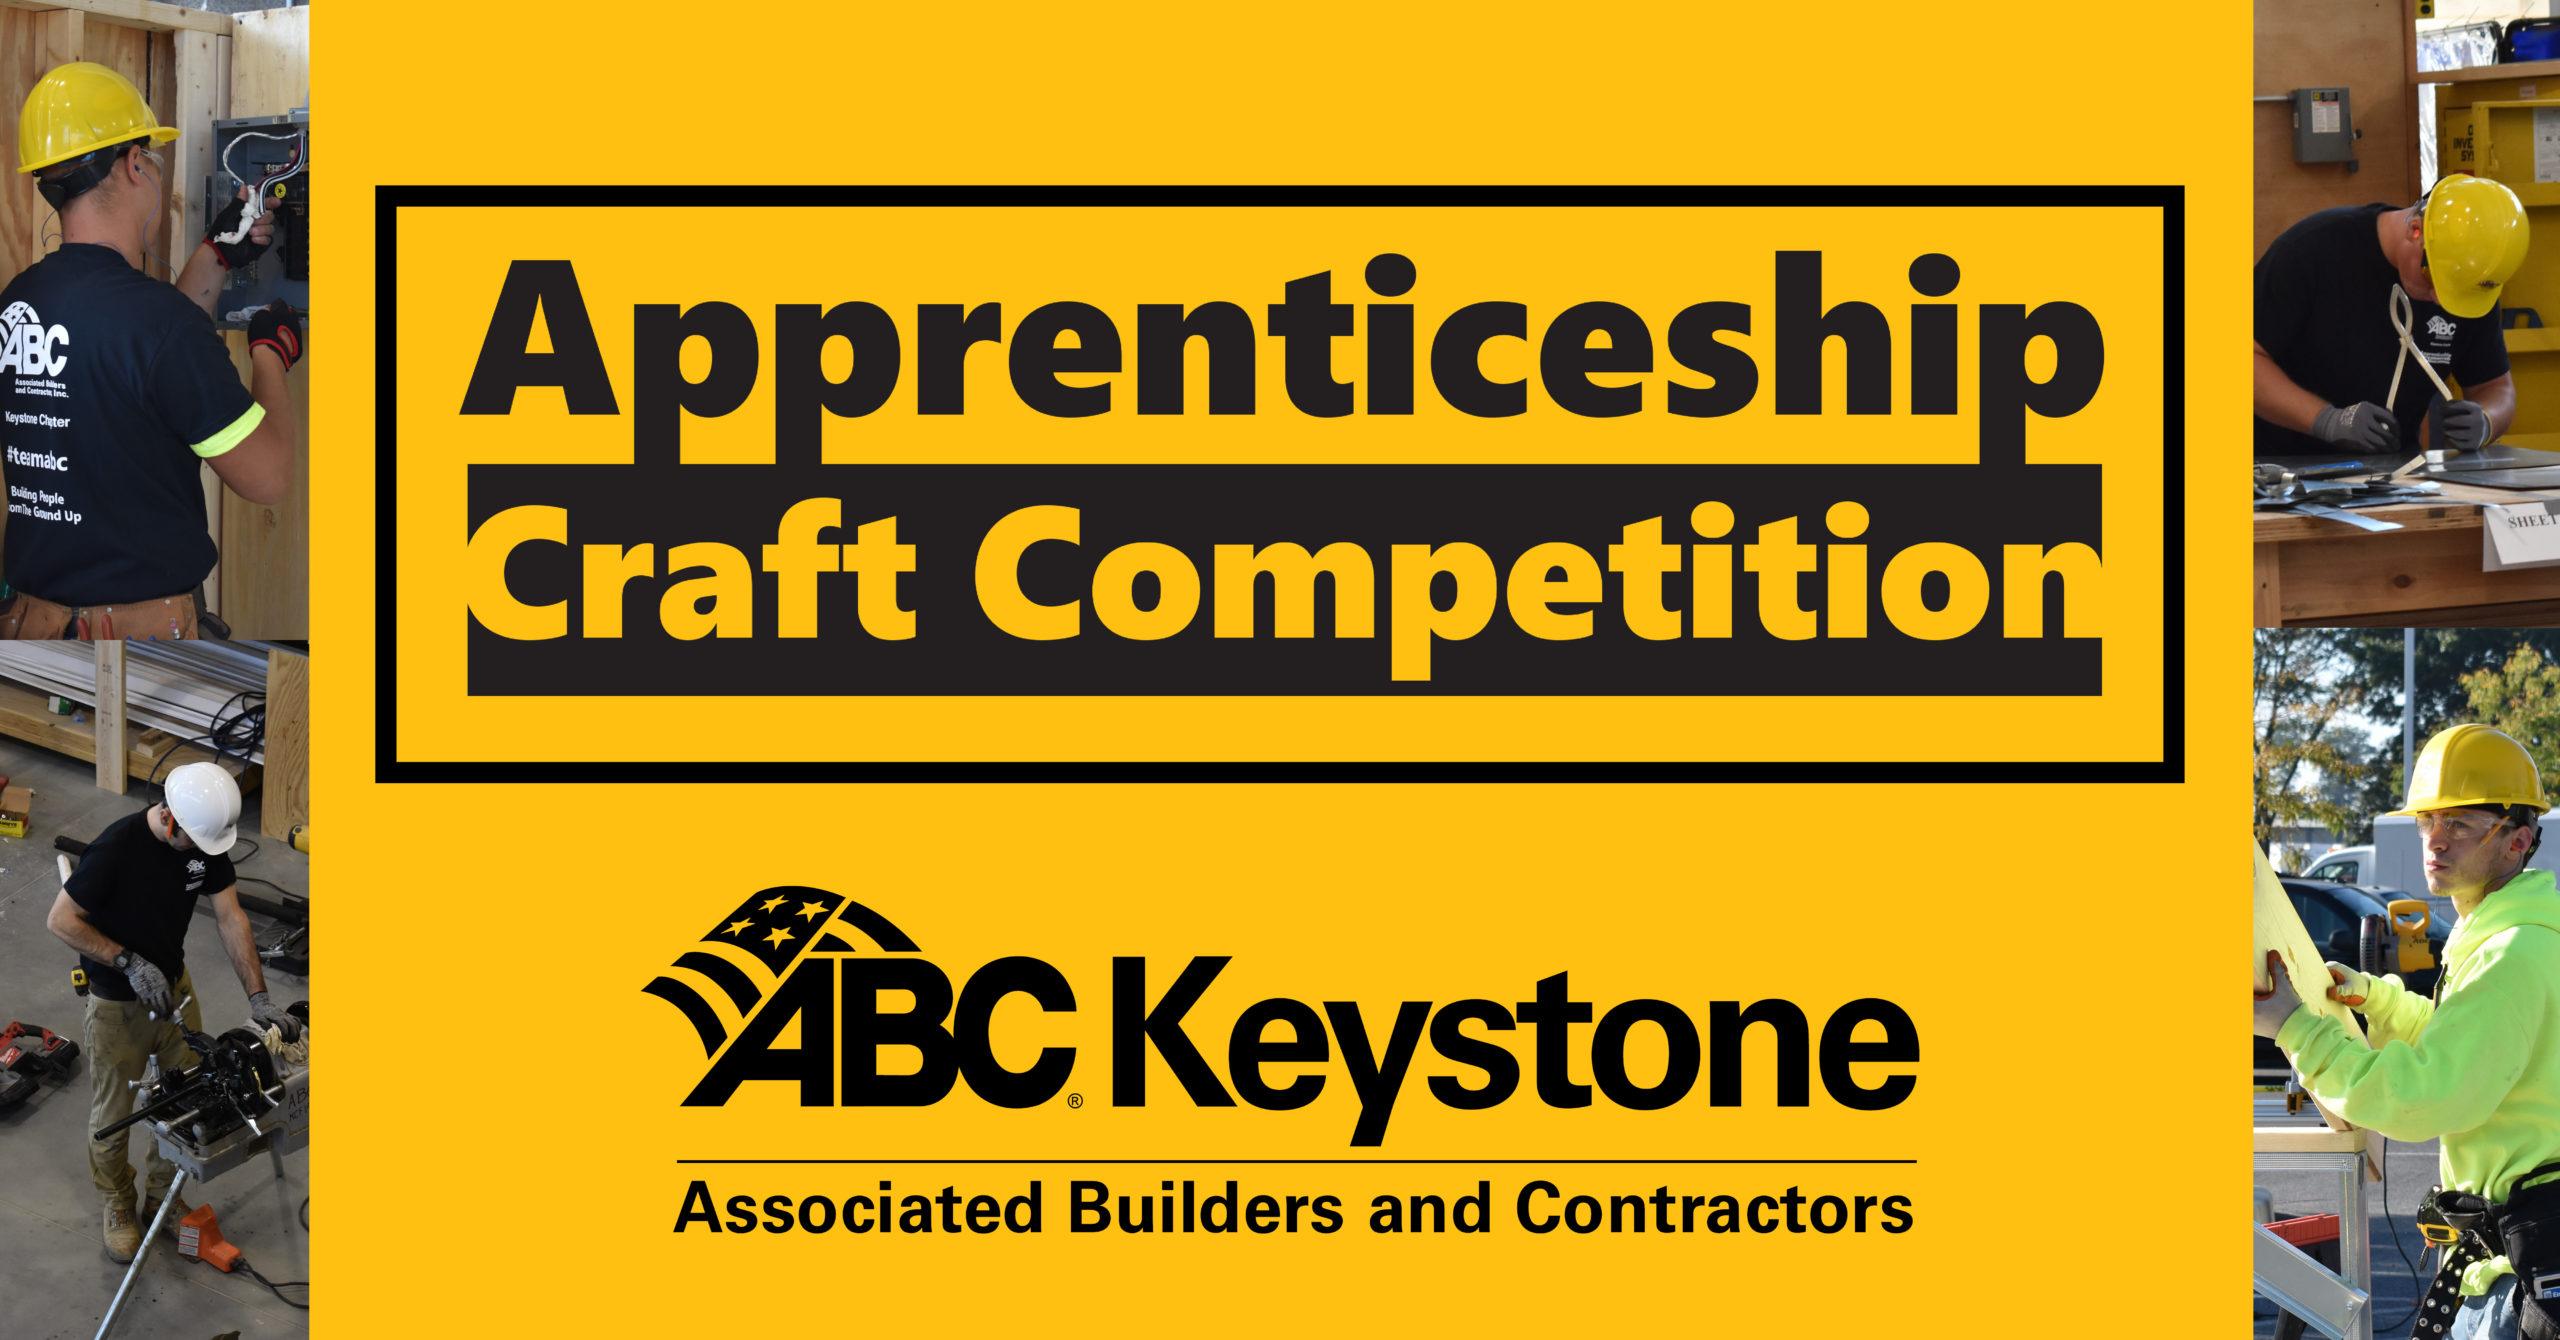 ABC Keystone Apprenticeship Craft Competition